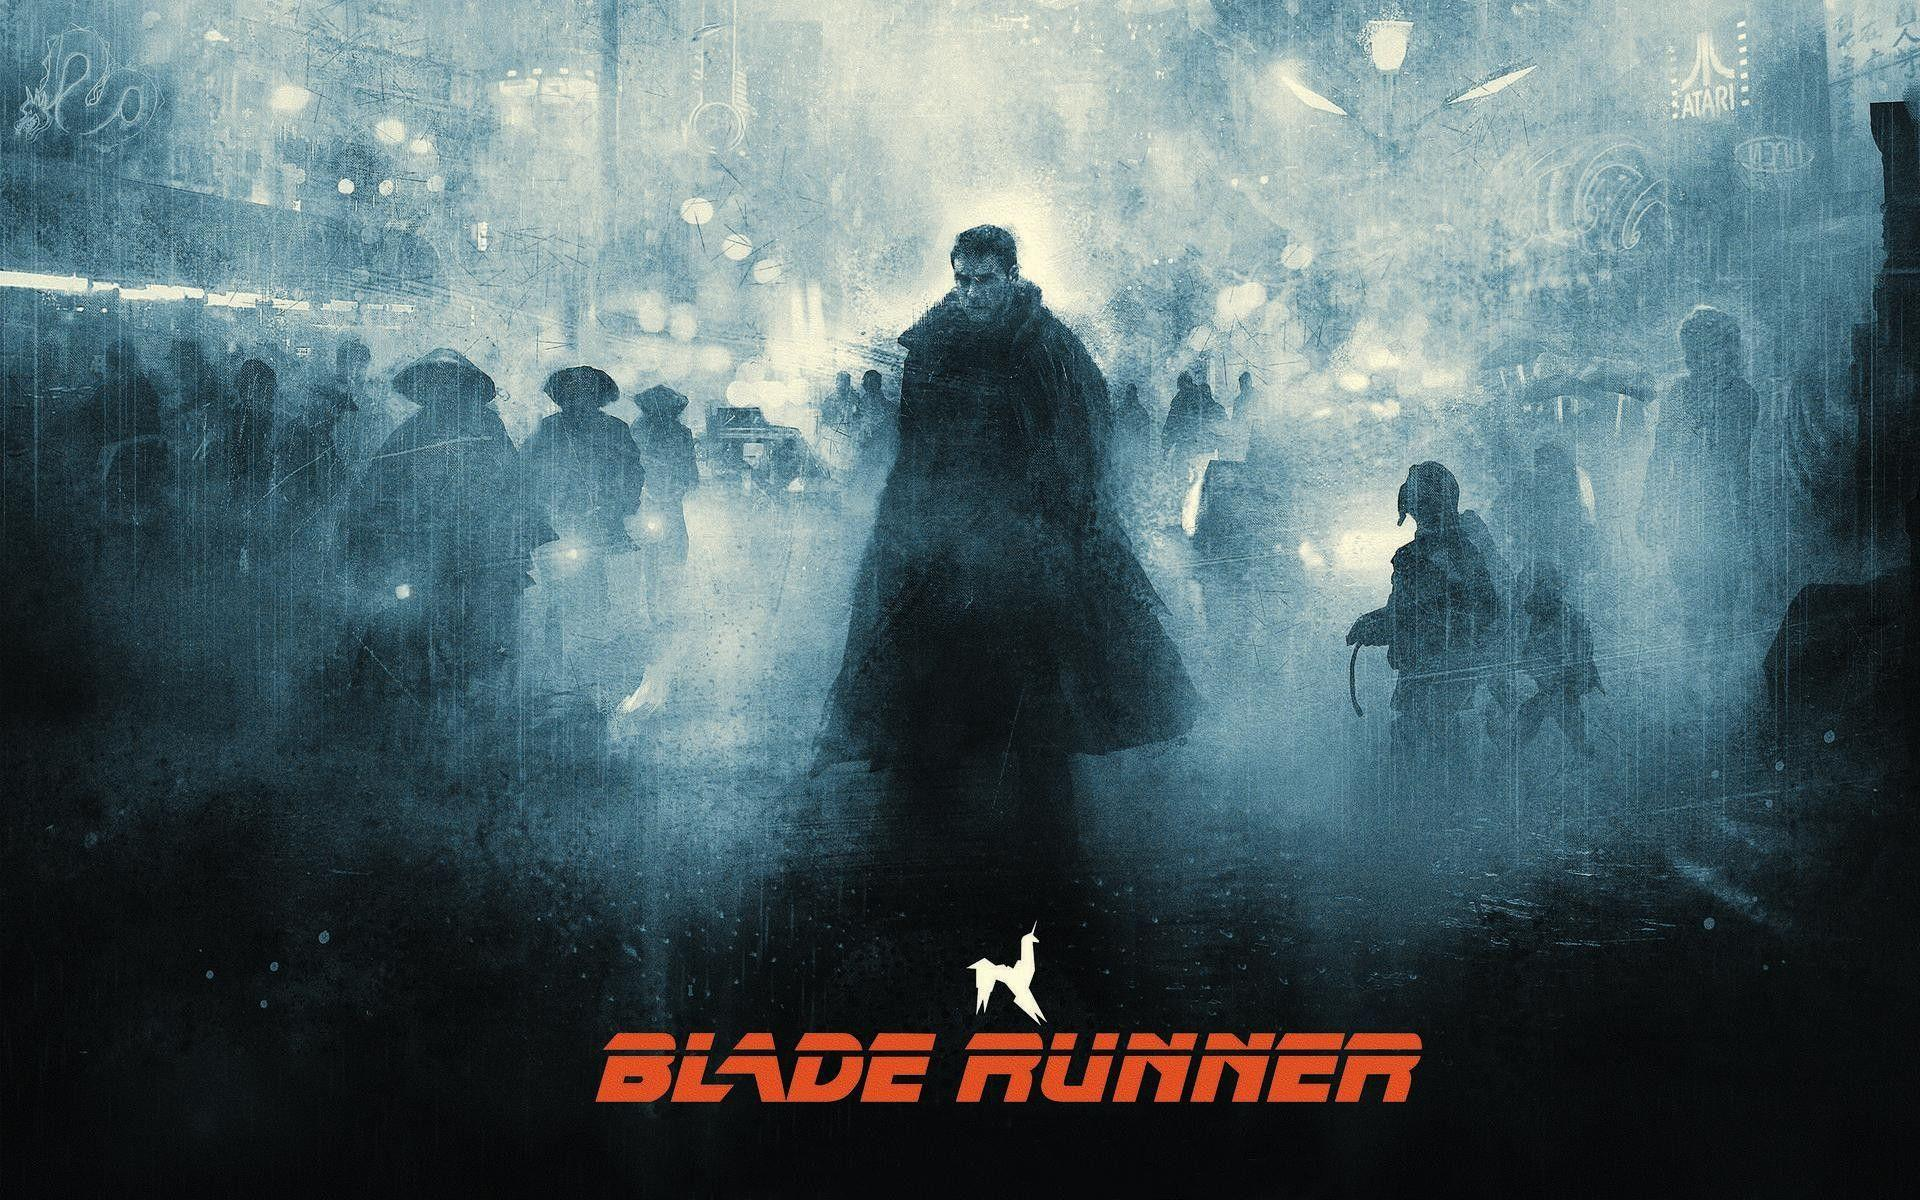 Blade Runner 2049 Wallpapers Wallpaper Cave